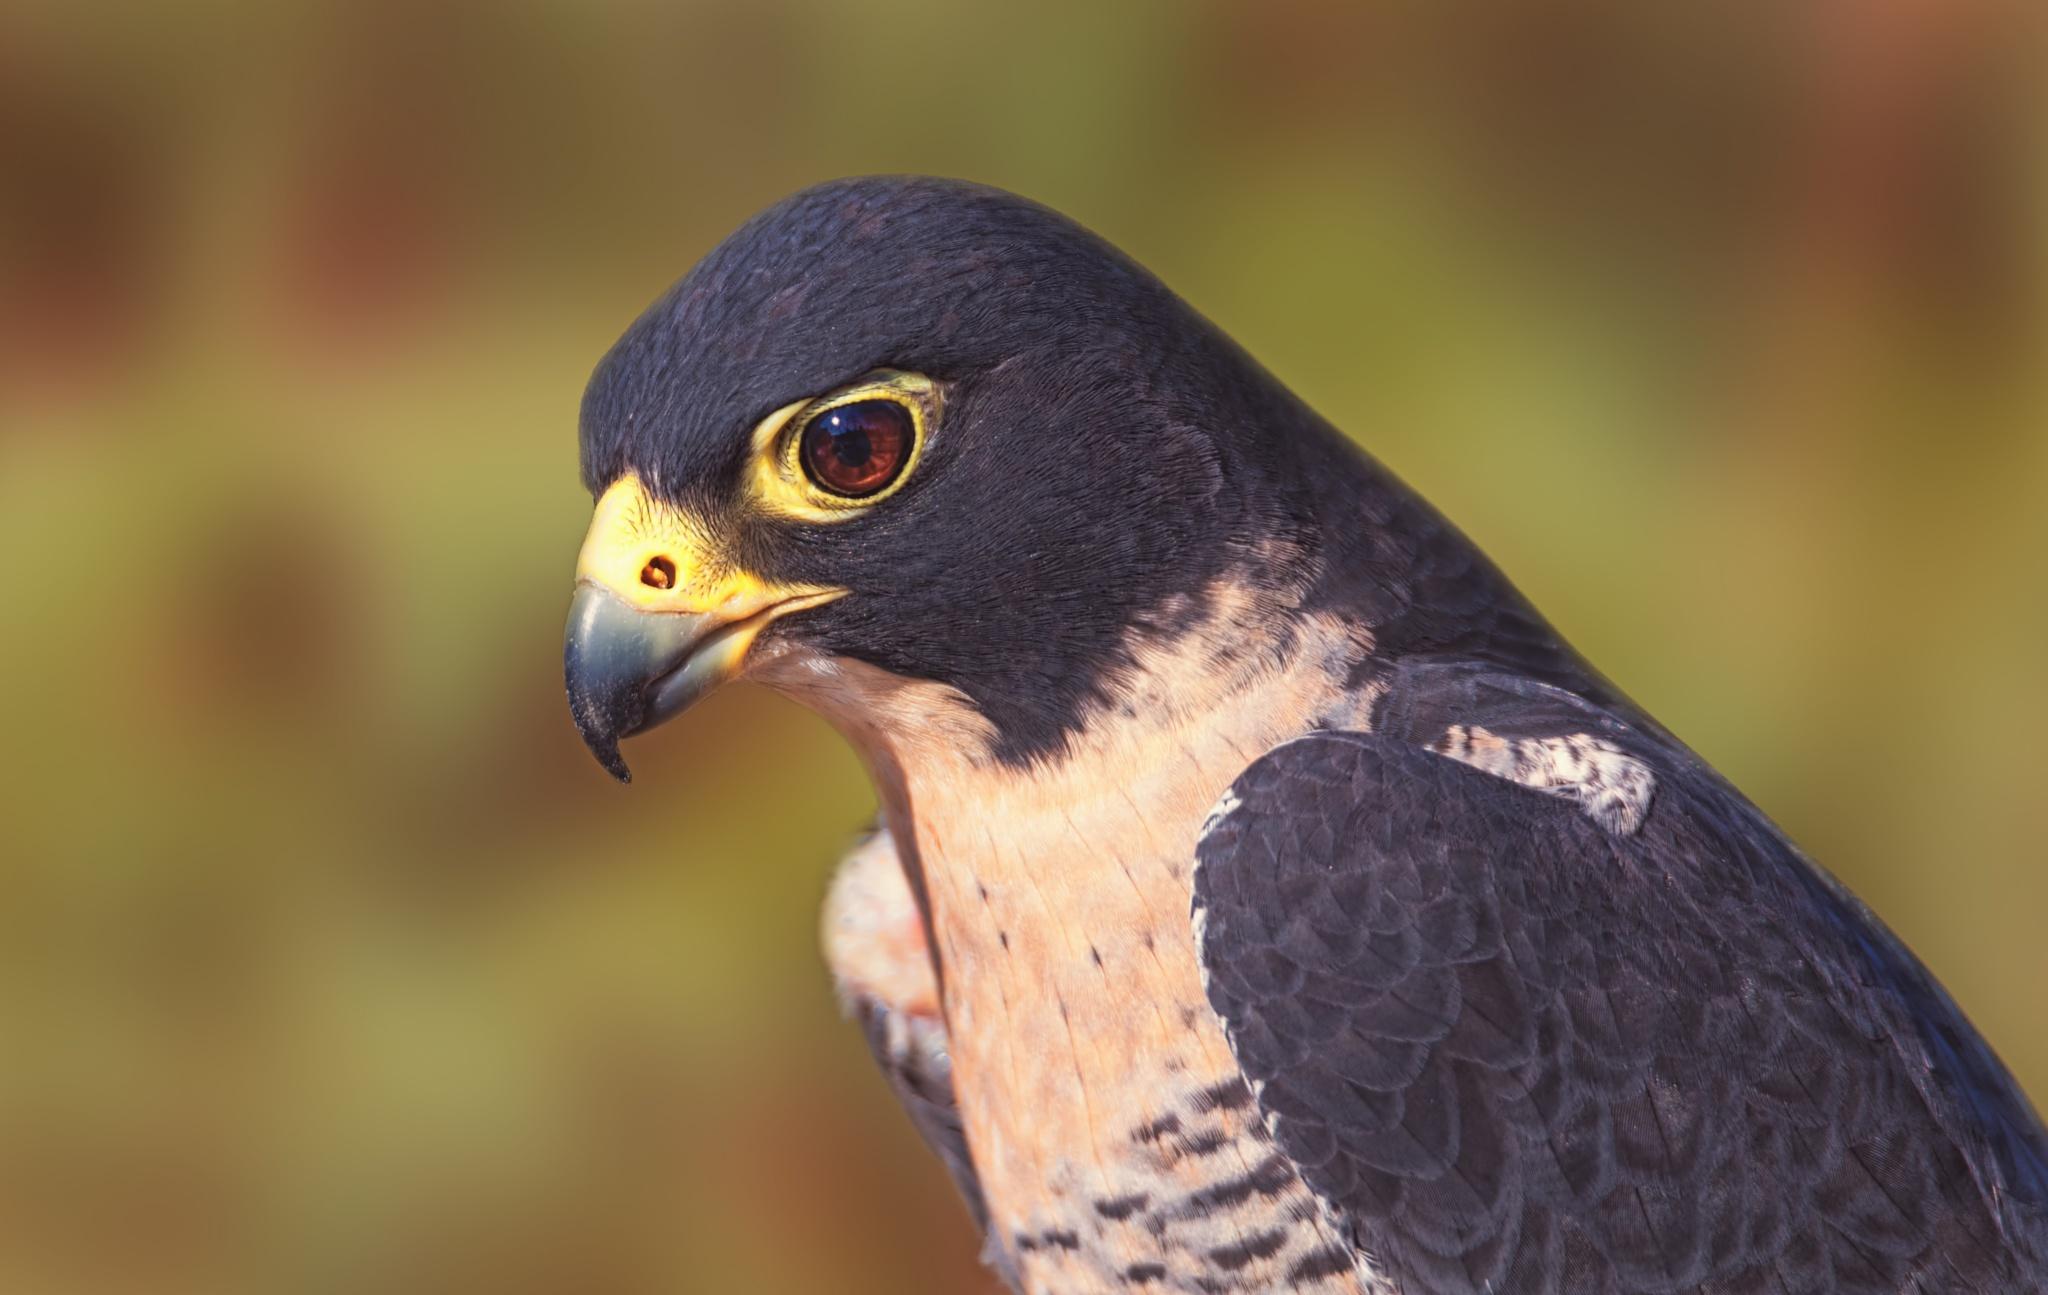 Peregrine Falcon by CruzinCaninesPhotography